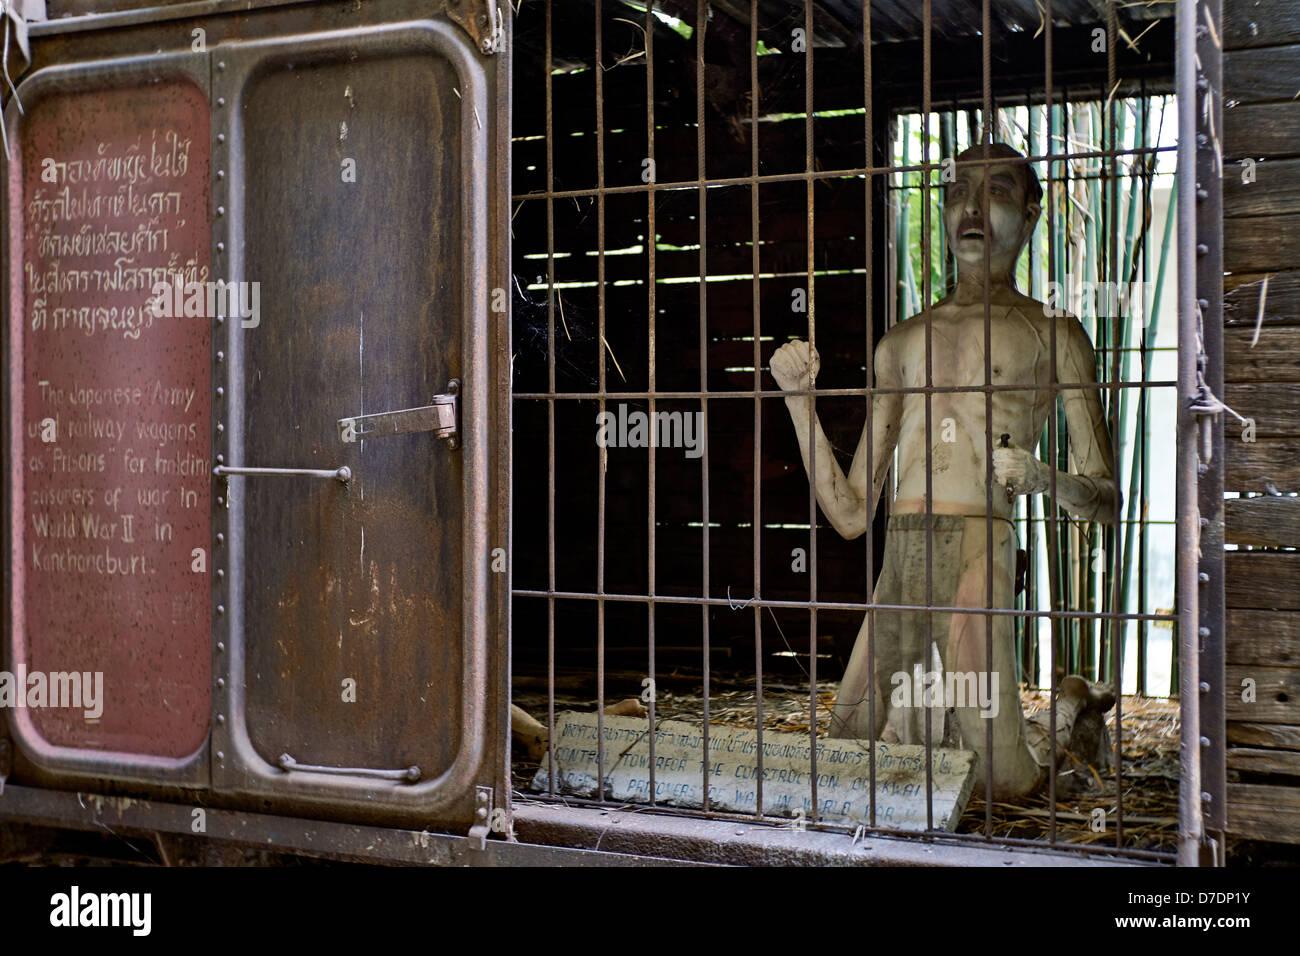 graphic characterisation of ww 2 prisoner of war confinement cells